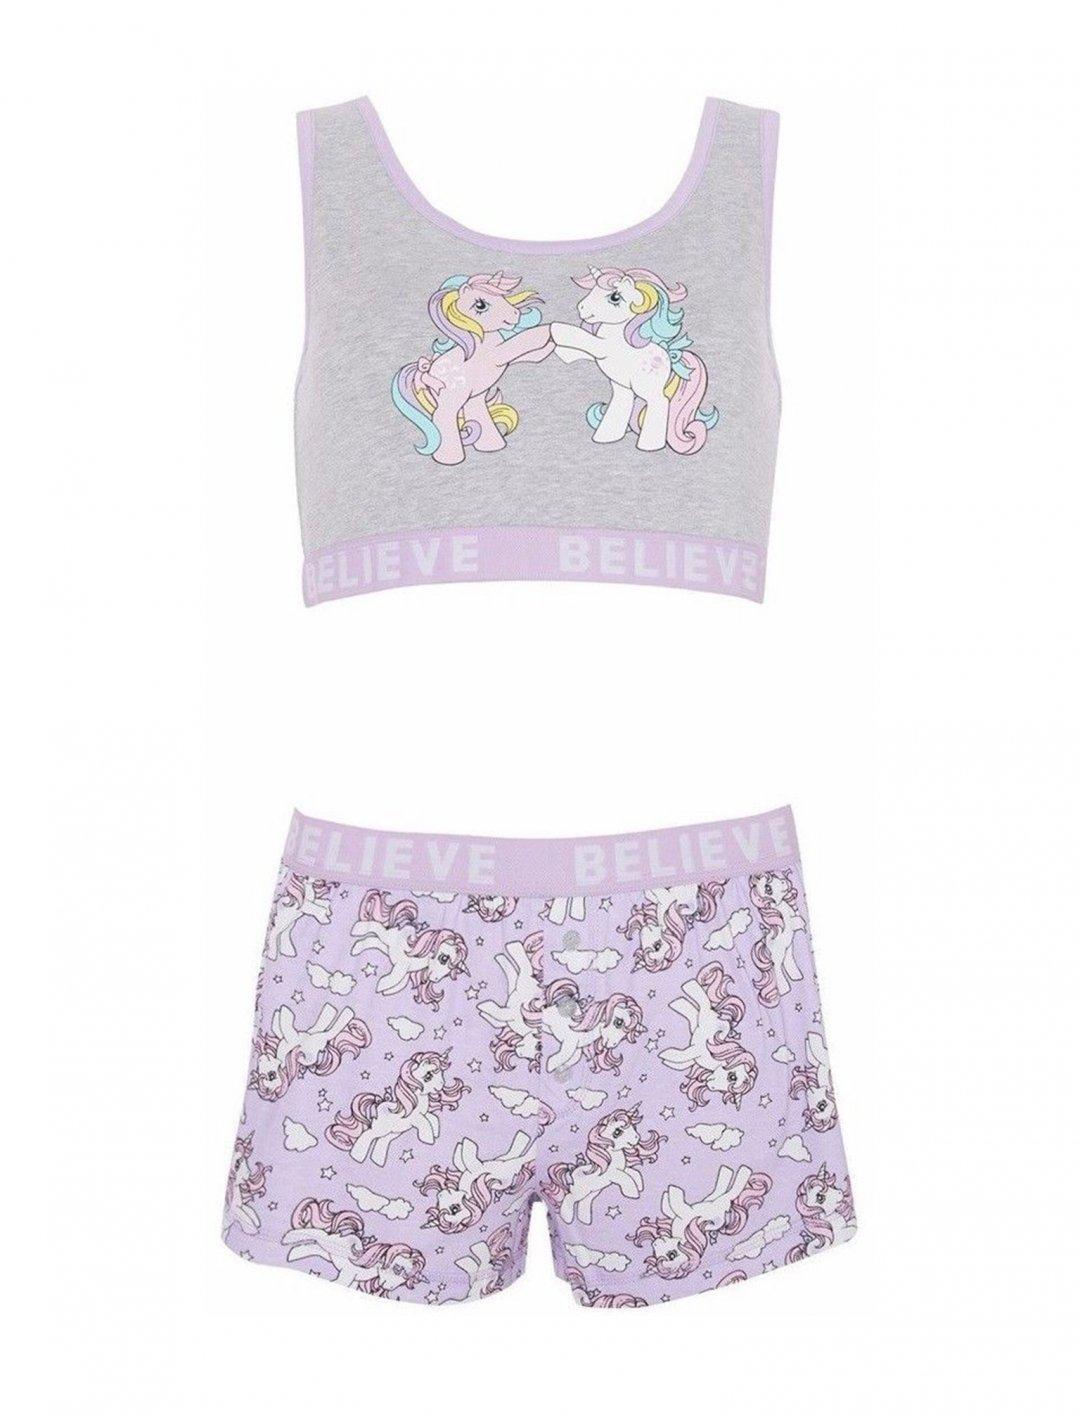 "Little Pony Pyjama Set {""id"":5,""product_section_id"":1,""name"":""Clothing"",""order"":5} Primark"